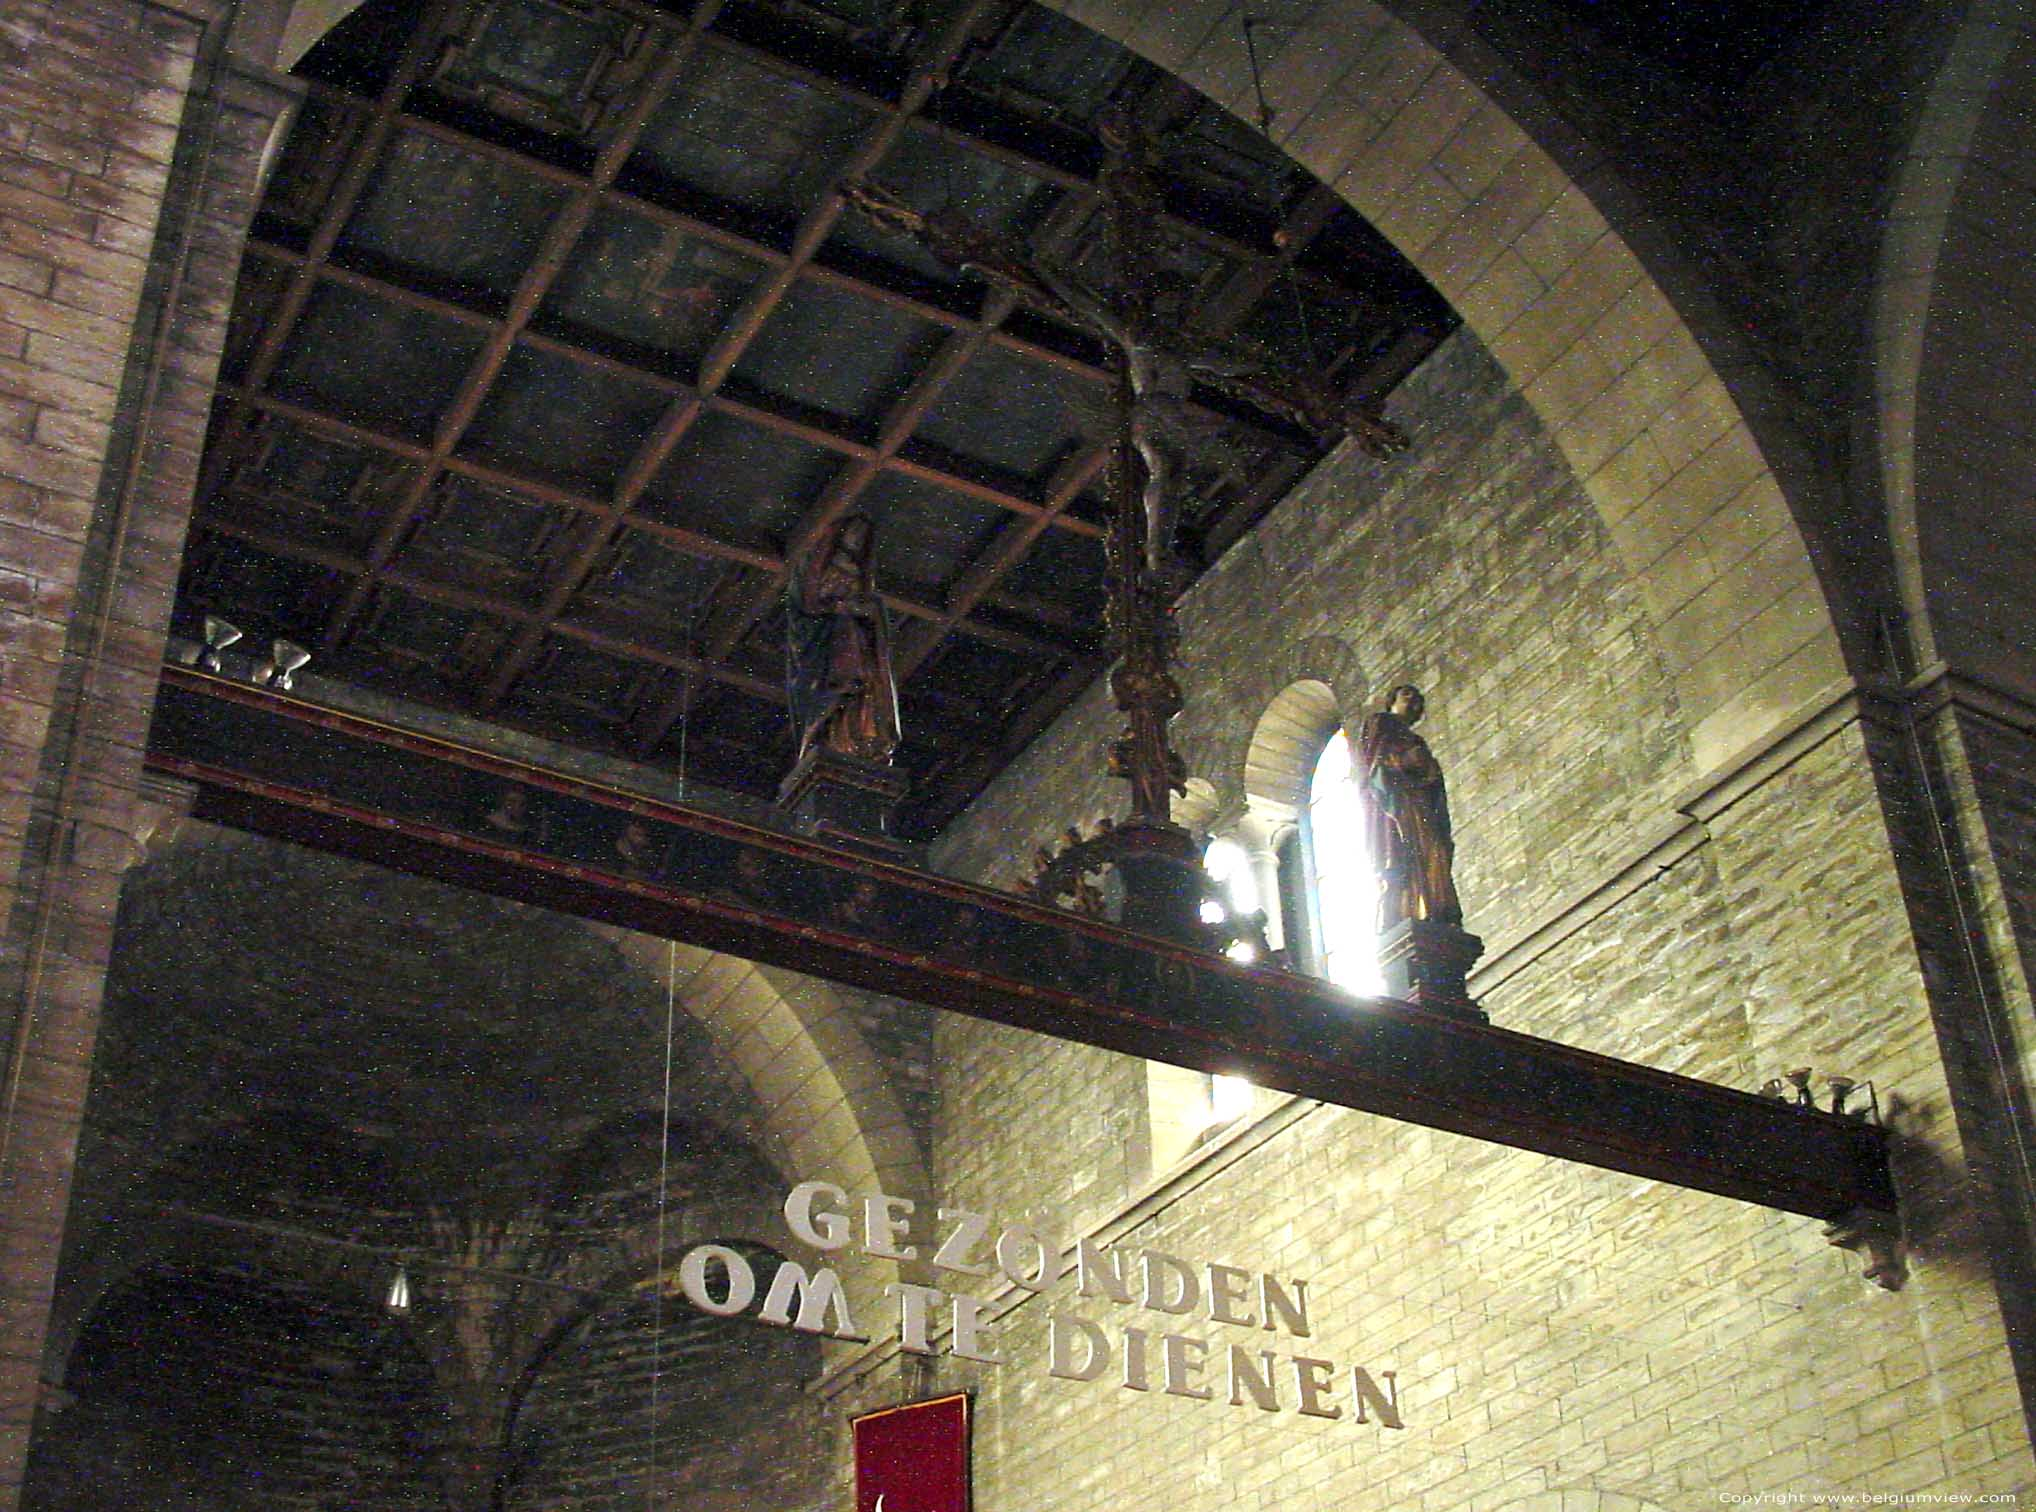 Eglise saint martin sint truiden saint trond photo for Geba interieur st truiden